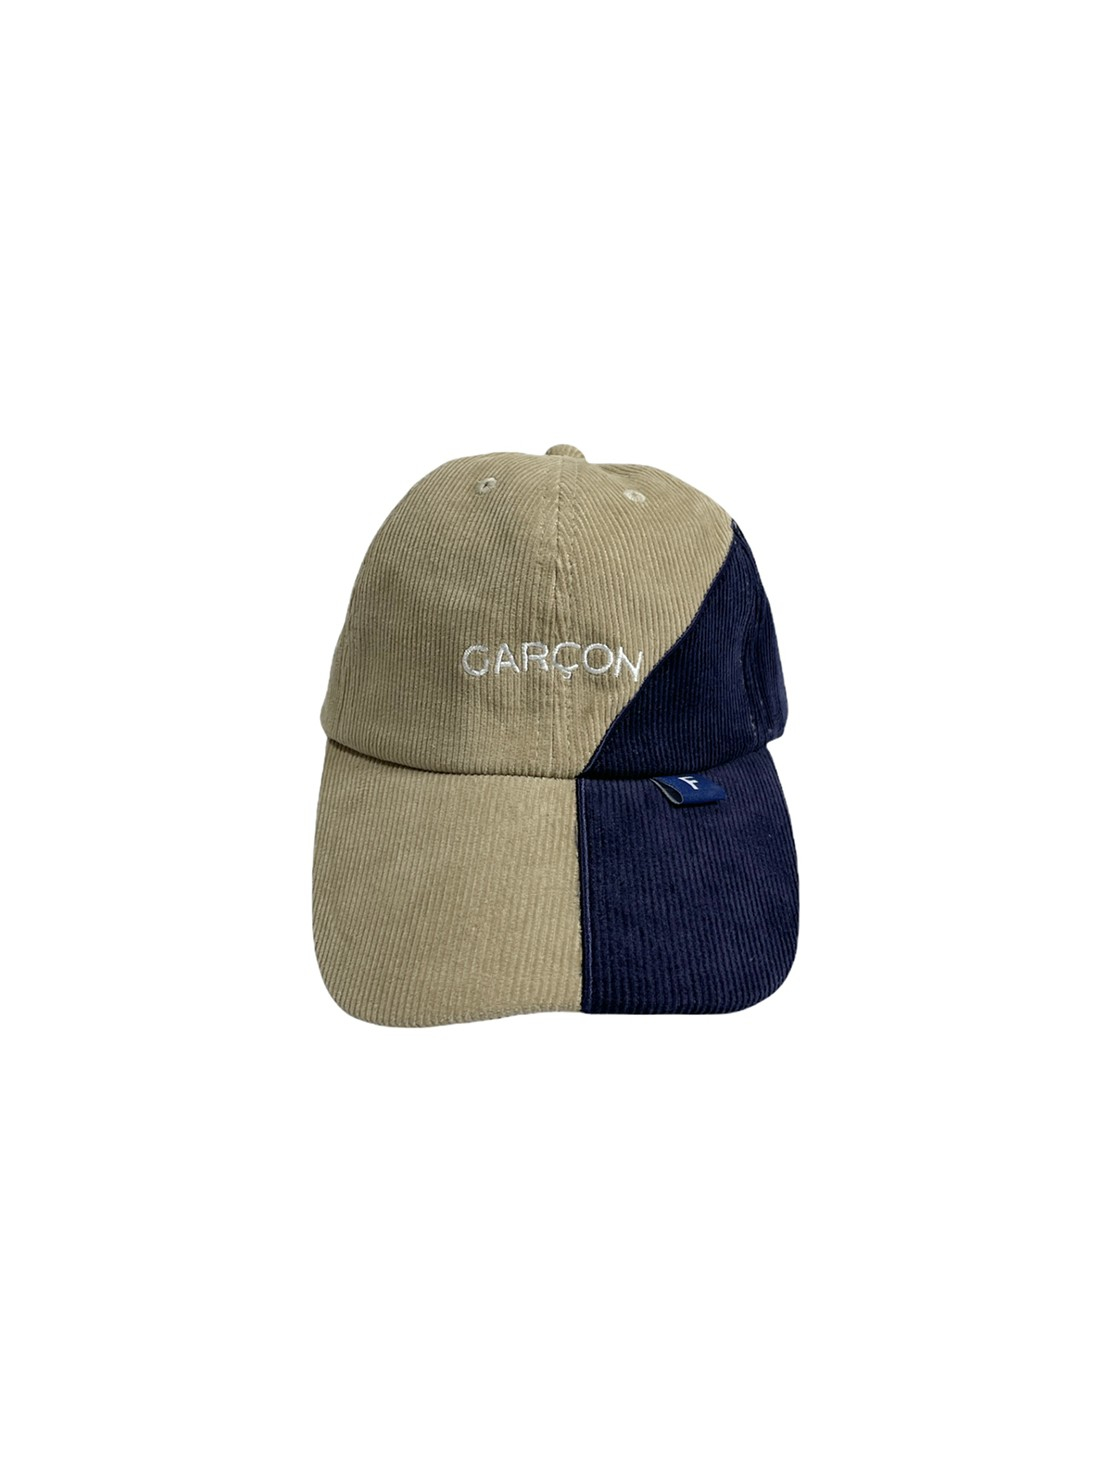 FRANK! Garcon 2-Tone Corduroy Cap (Sand/ FRANK Blue)